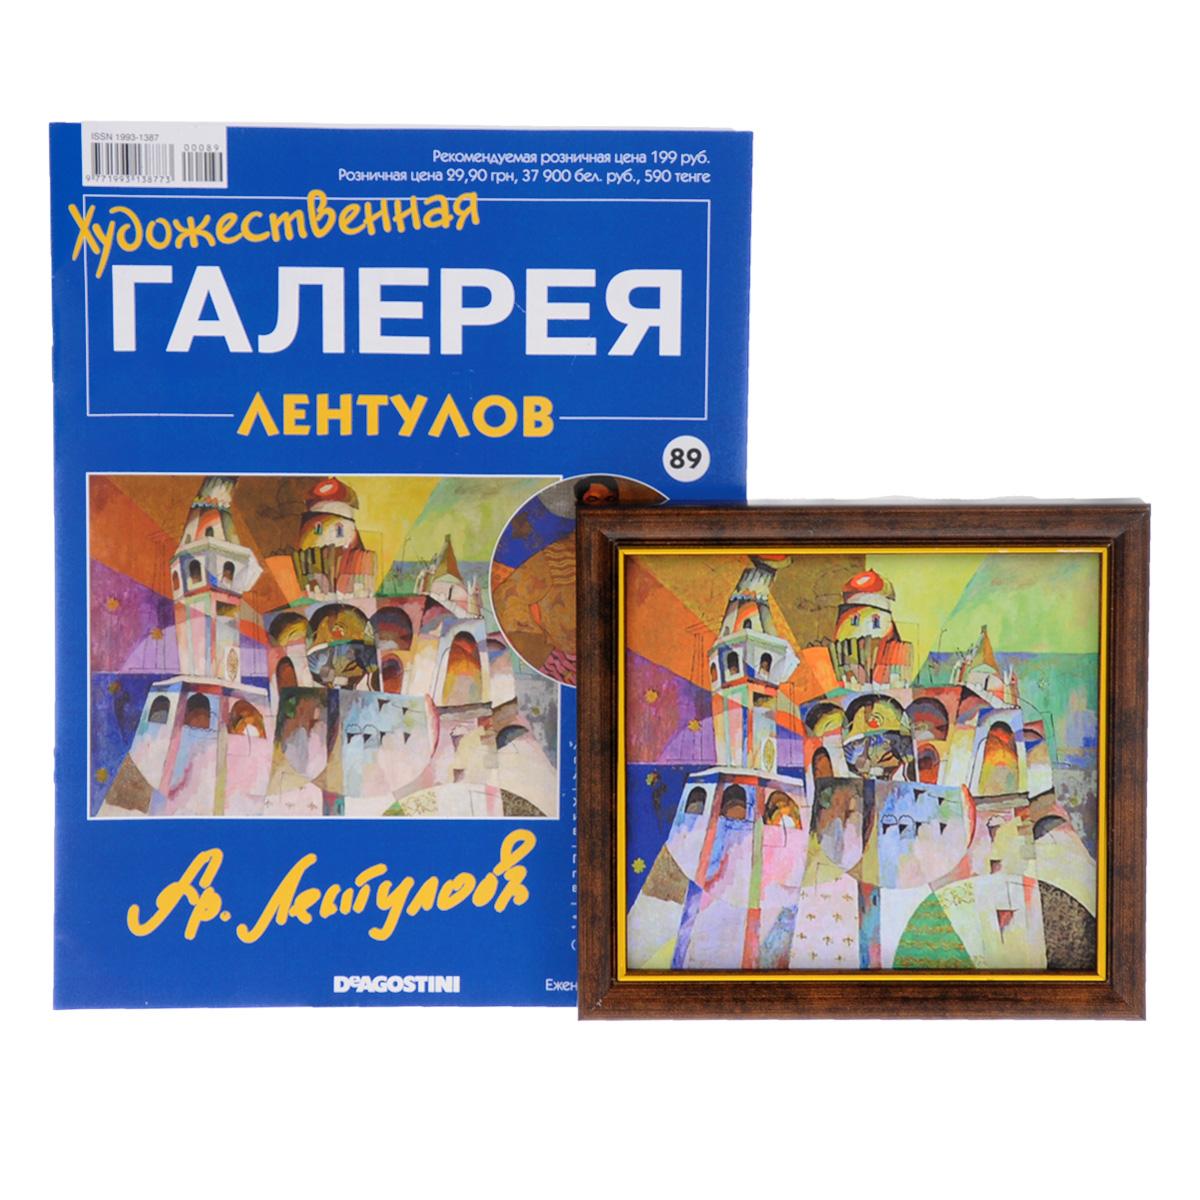 Журнал Художественная галерея № 89 журналы